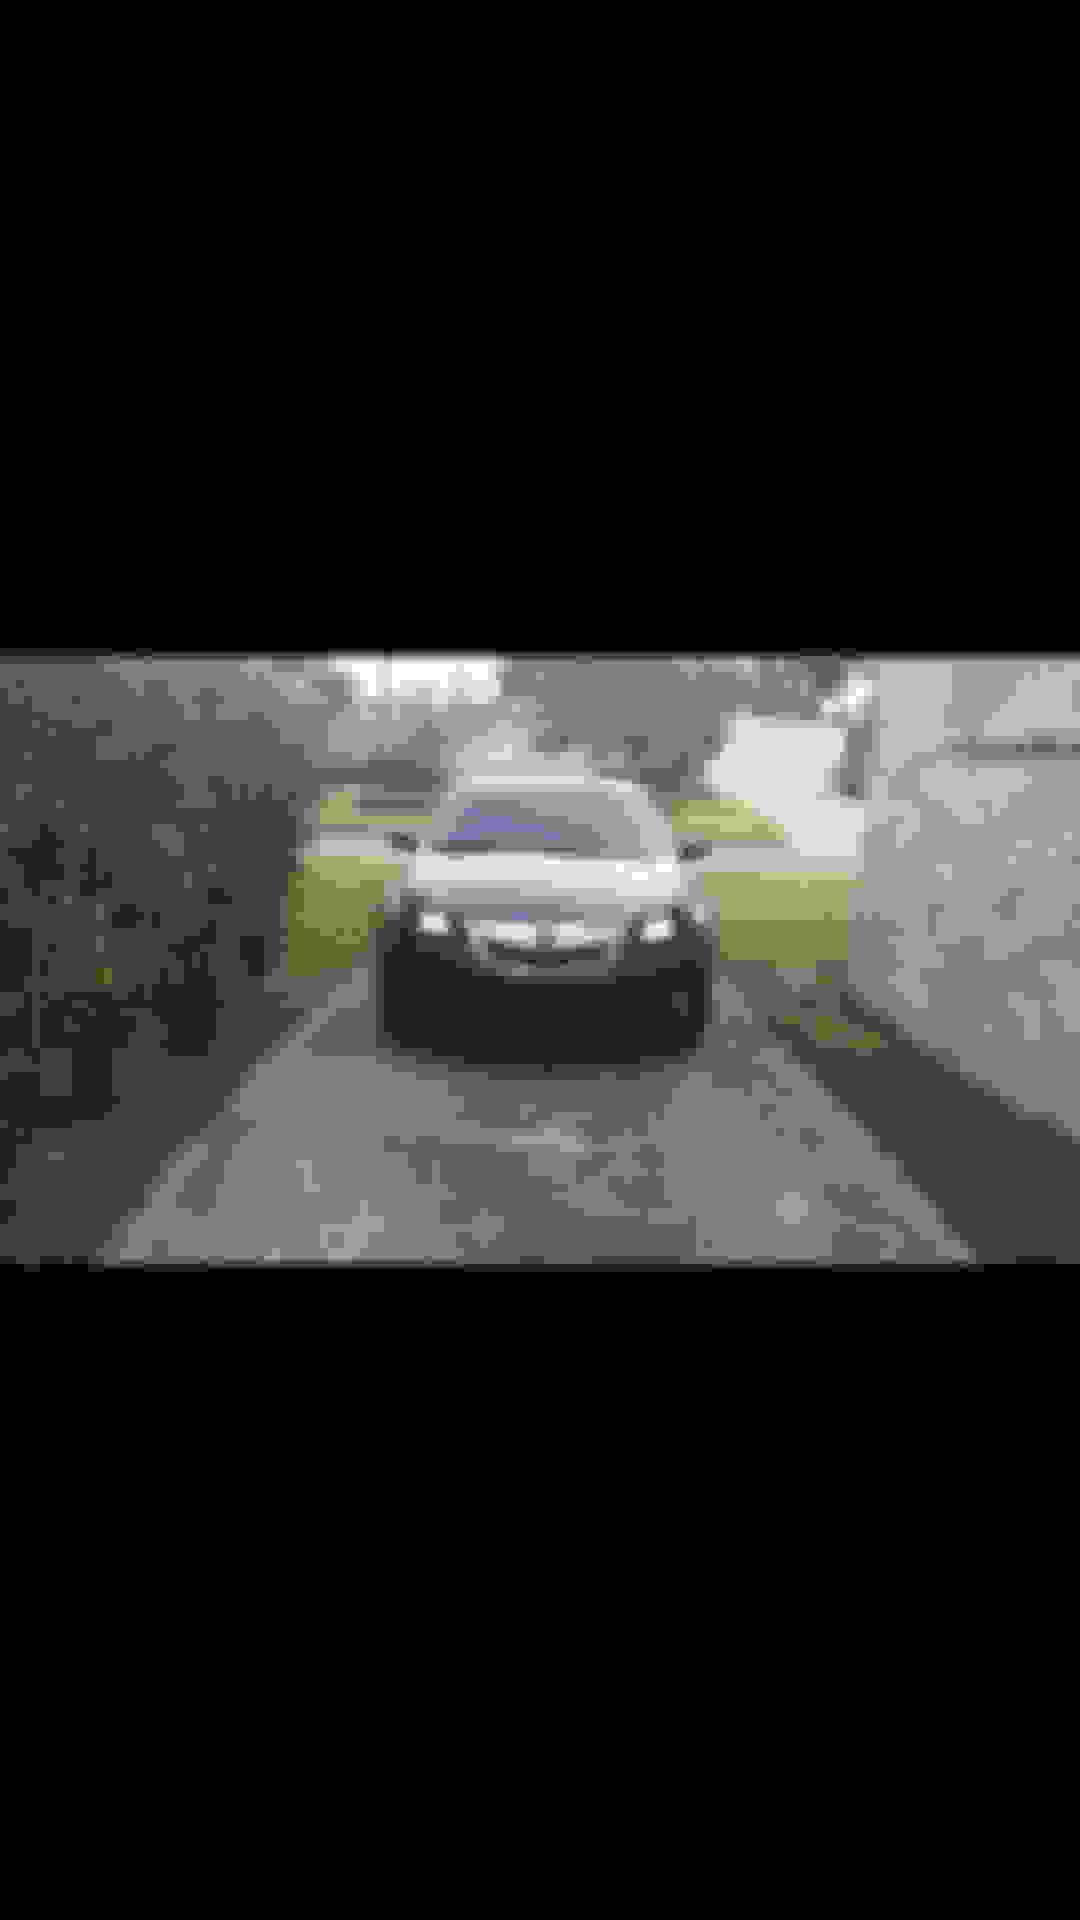 Auto Idle Stop: ANNOYING - AcuraZine - Acura Enthusiast